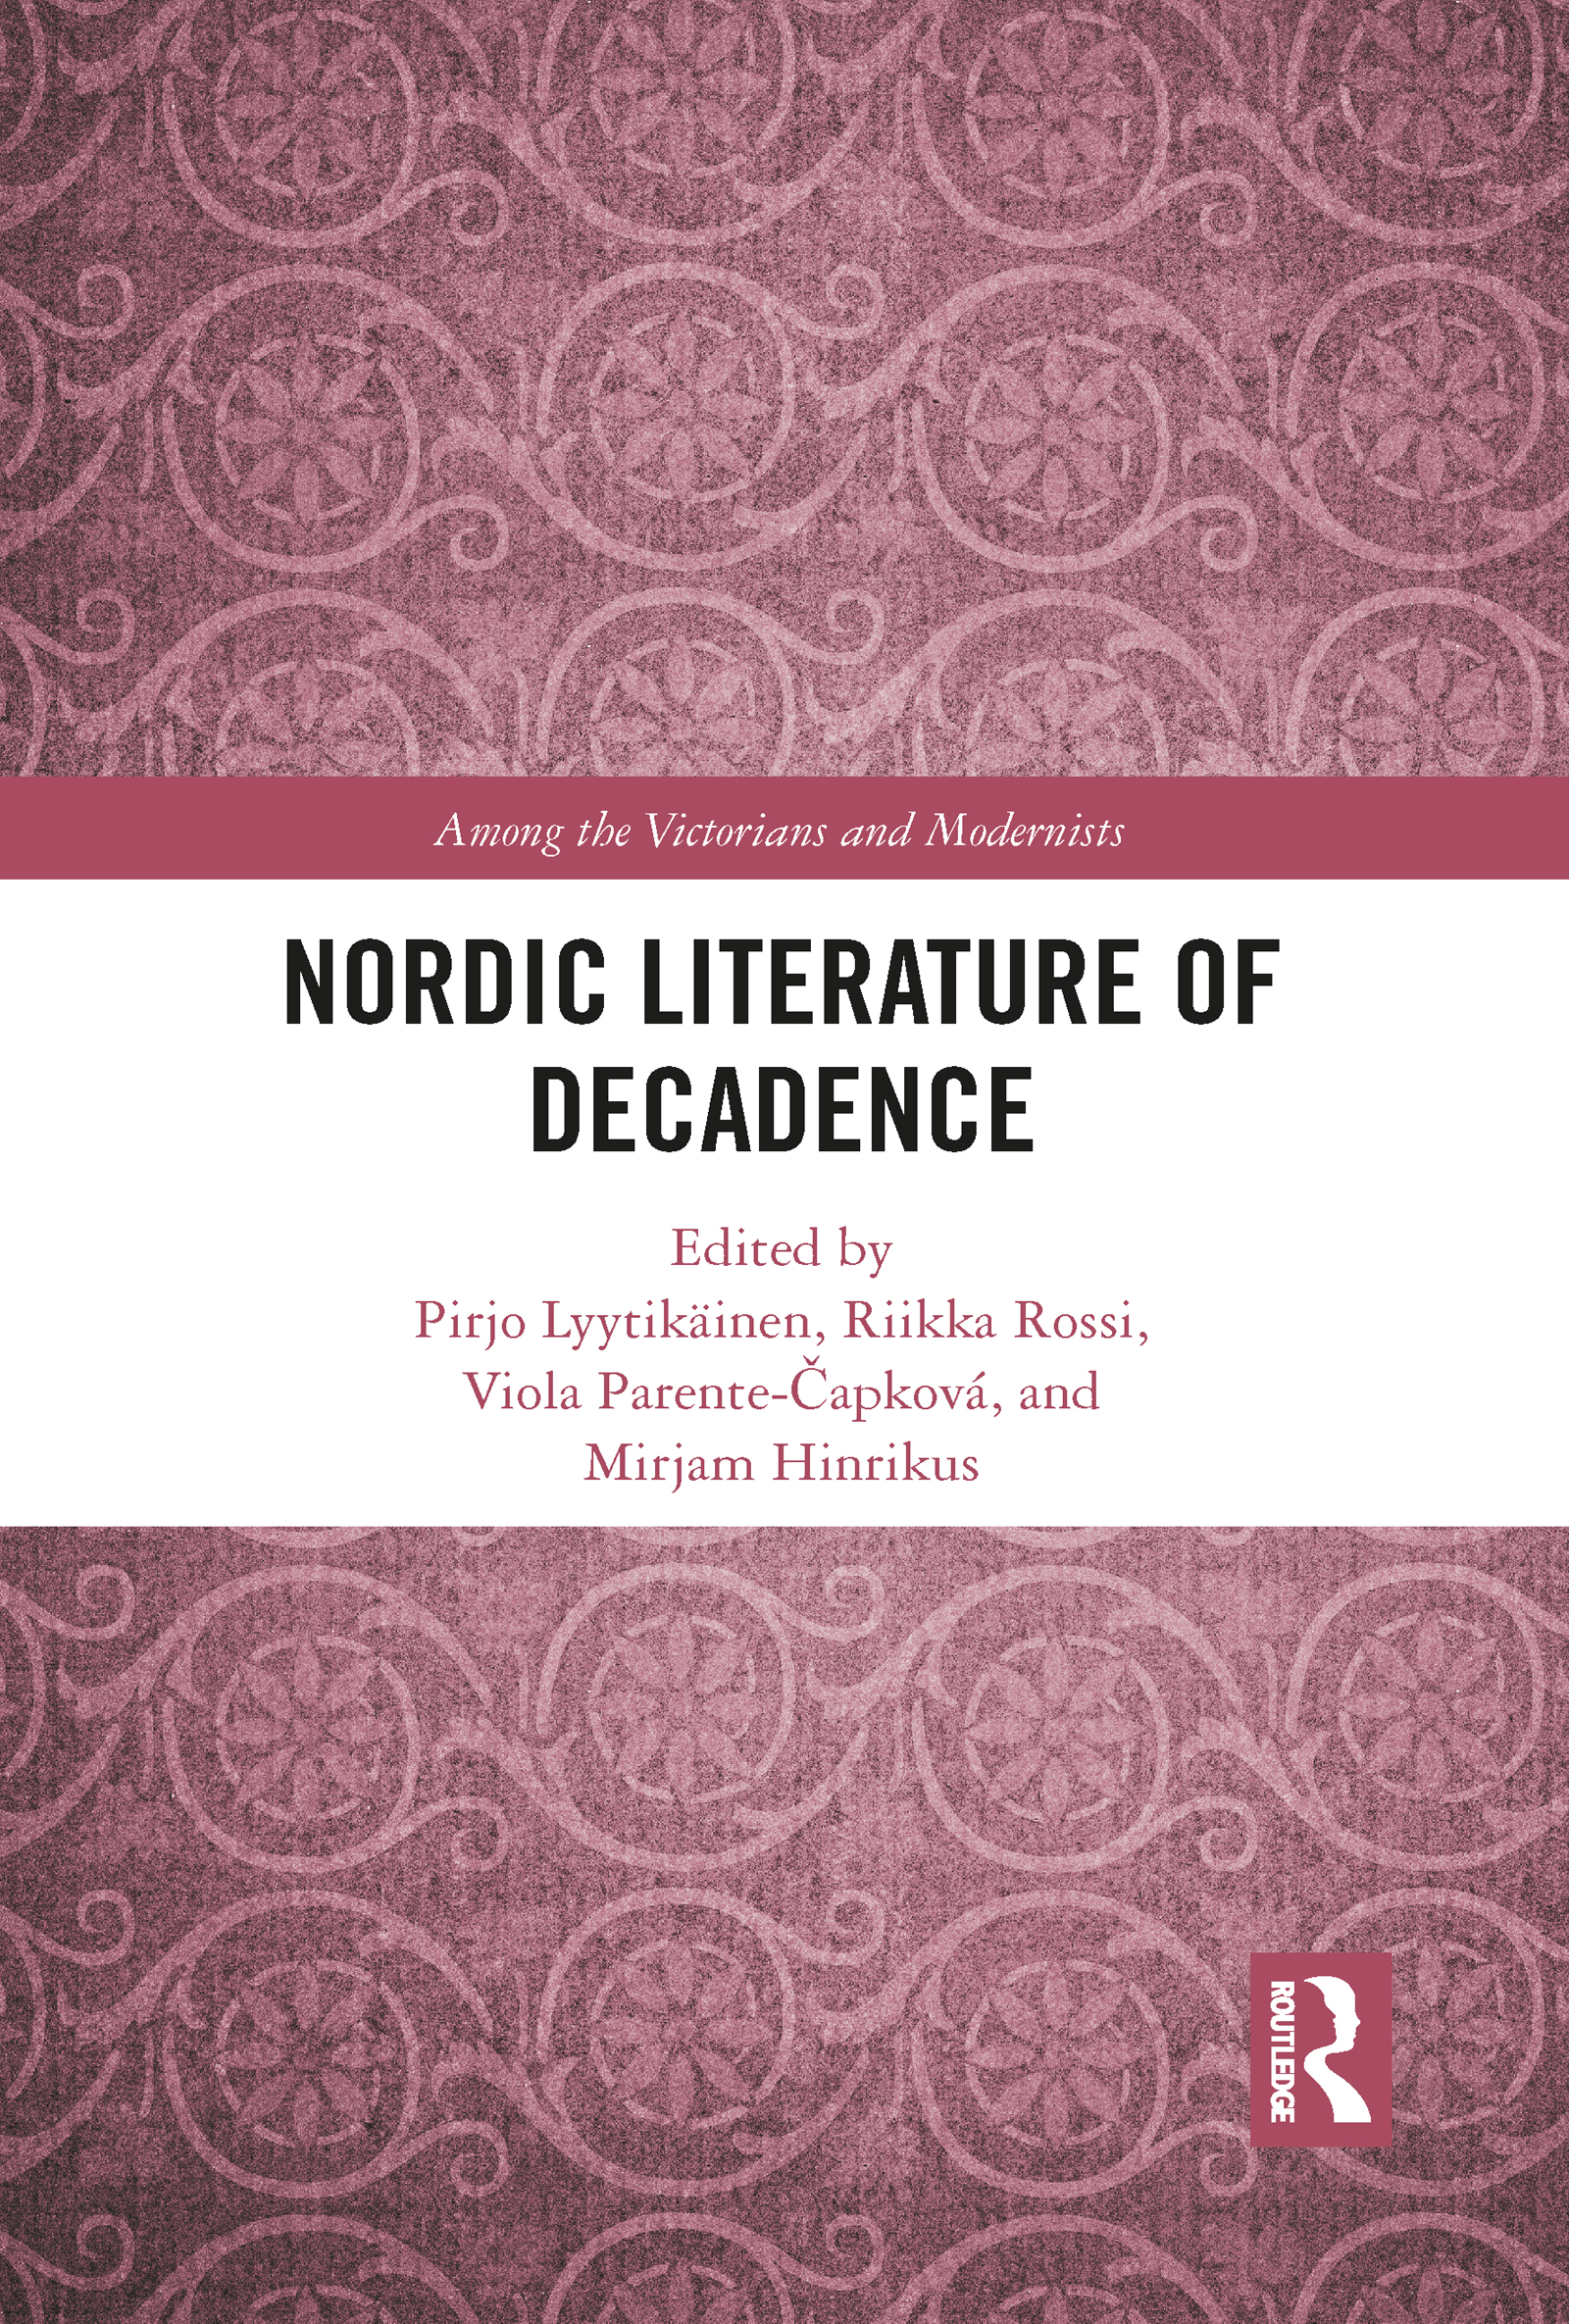 Nordic Literature of Decadence